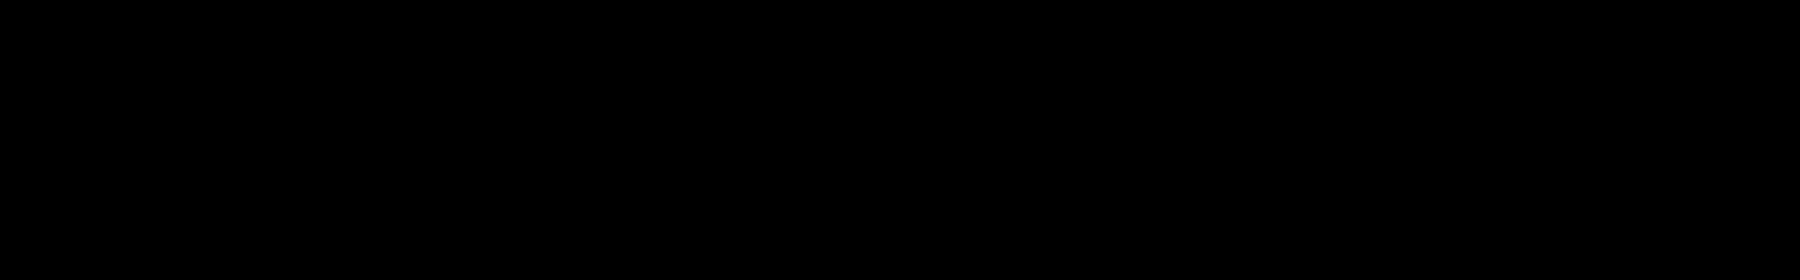 Dripp audio waveform